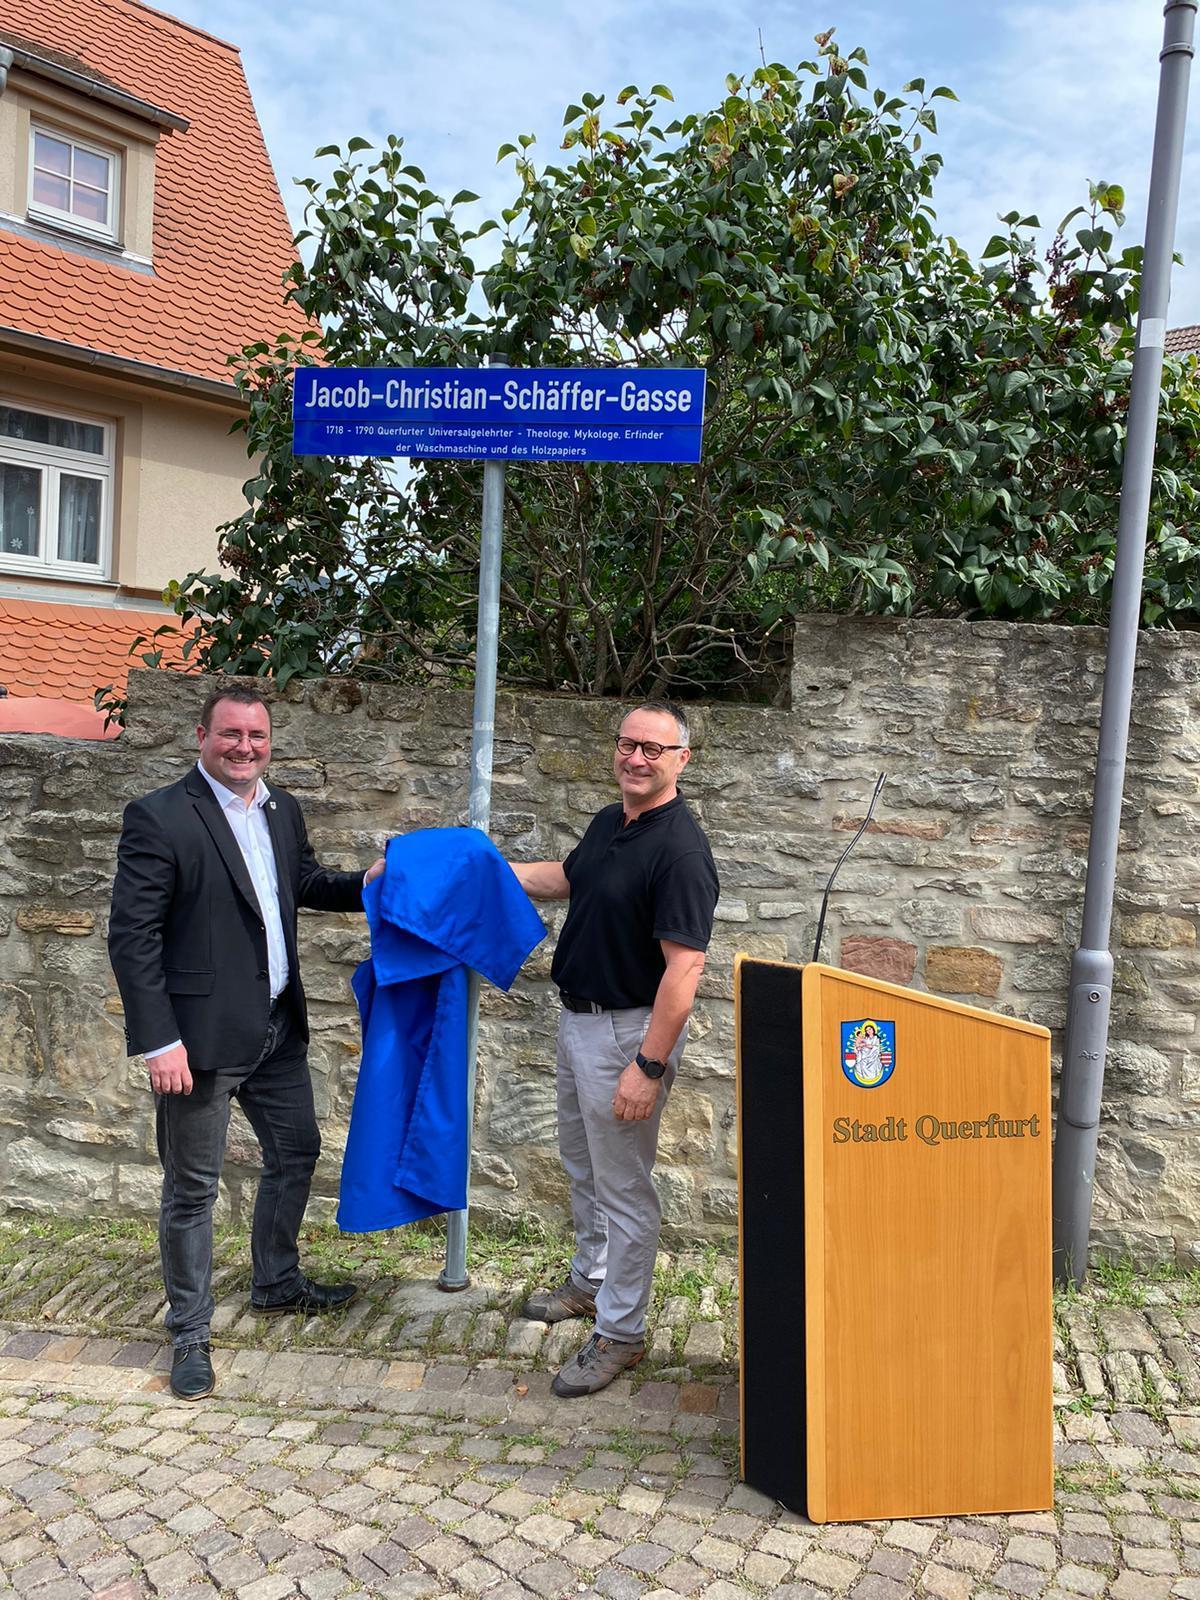 Gemeinsam mit Tierarzt Gunnar Schwarz enthüllt Bürgermeister Andreas Nette das Zusatzschild an der Christian-Jacob-Schäffer-Gasse